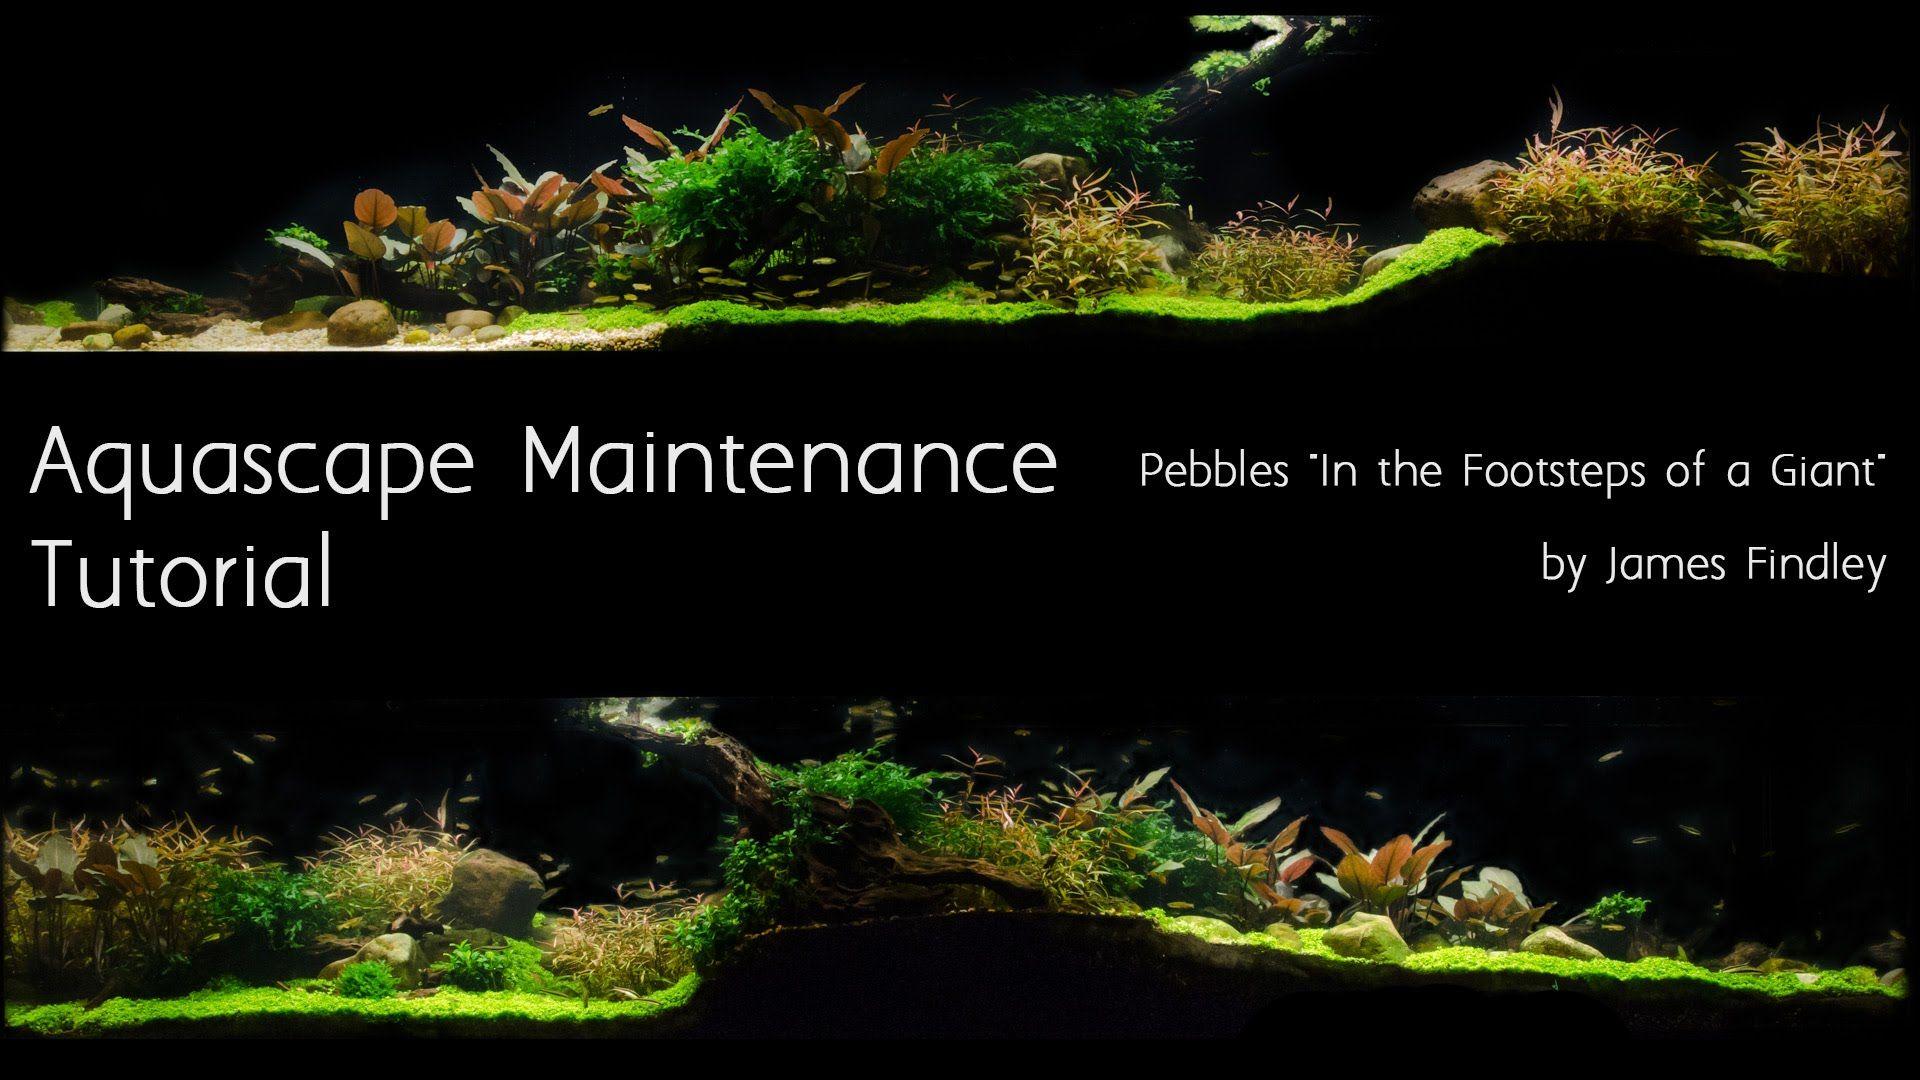 Aquascape Maintenance Guide The Green Machine º Aquascapes º